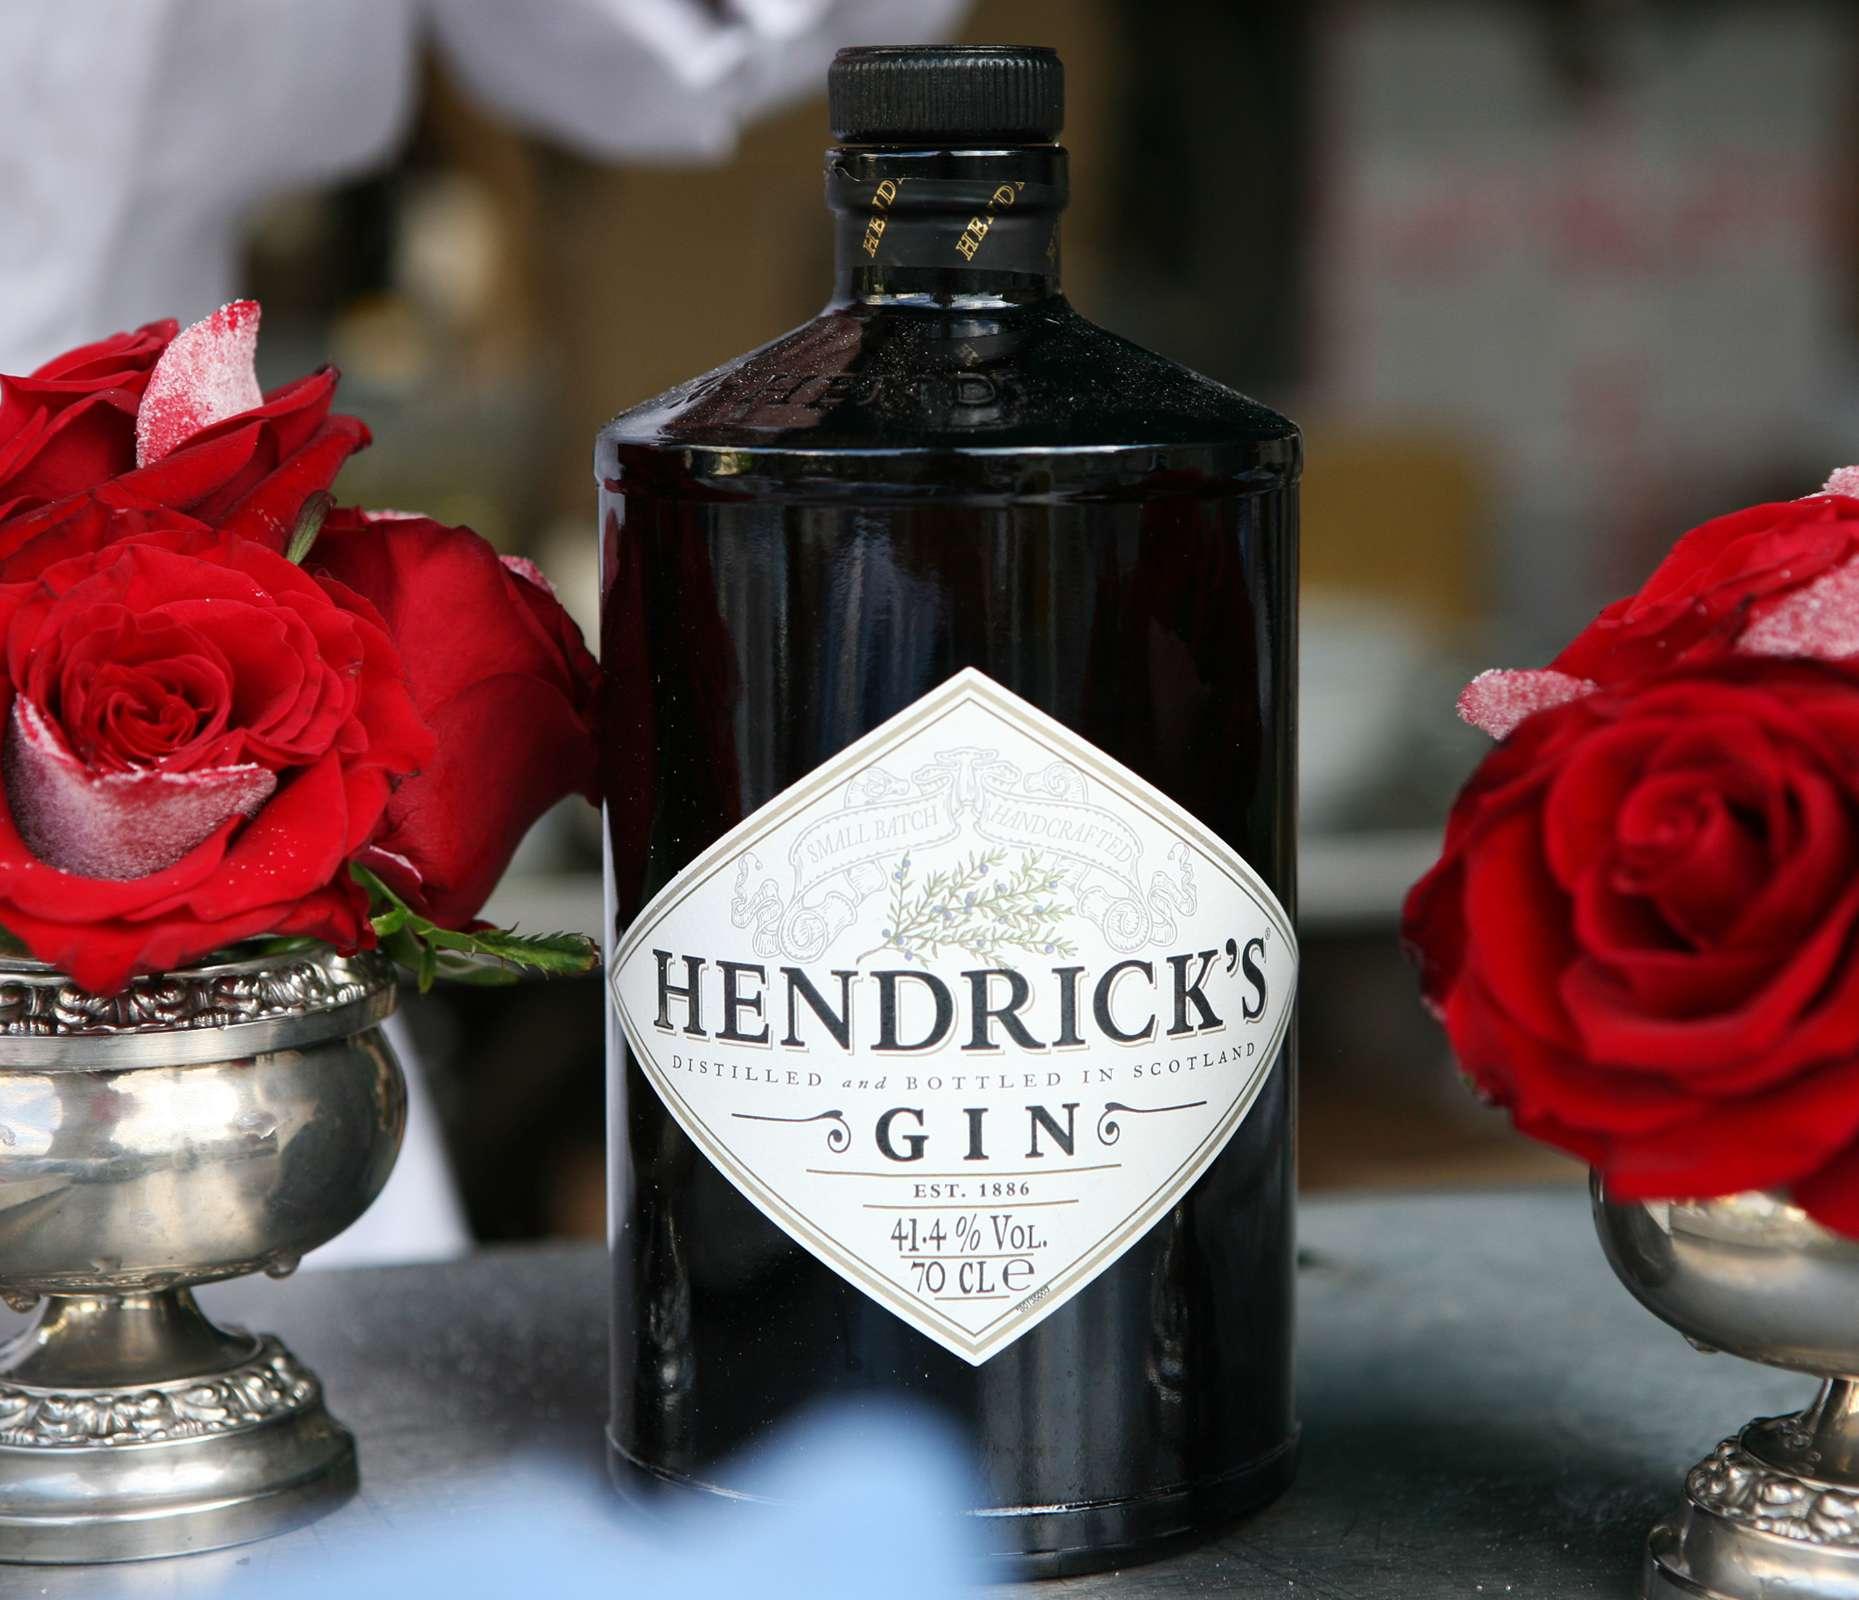 hendricks_08_2